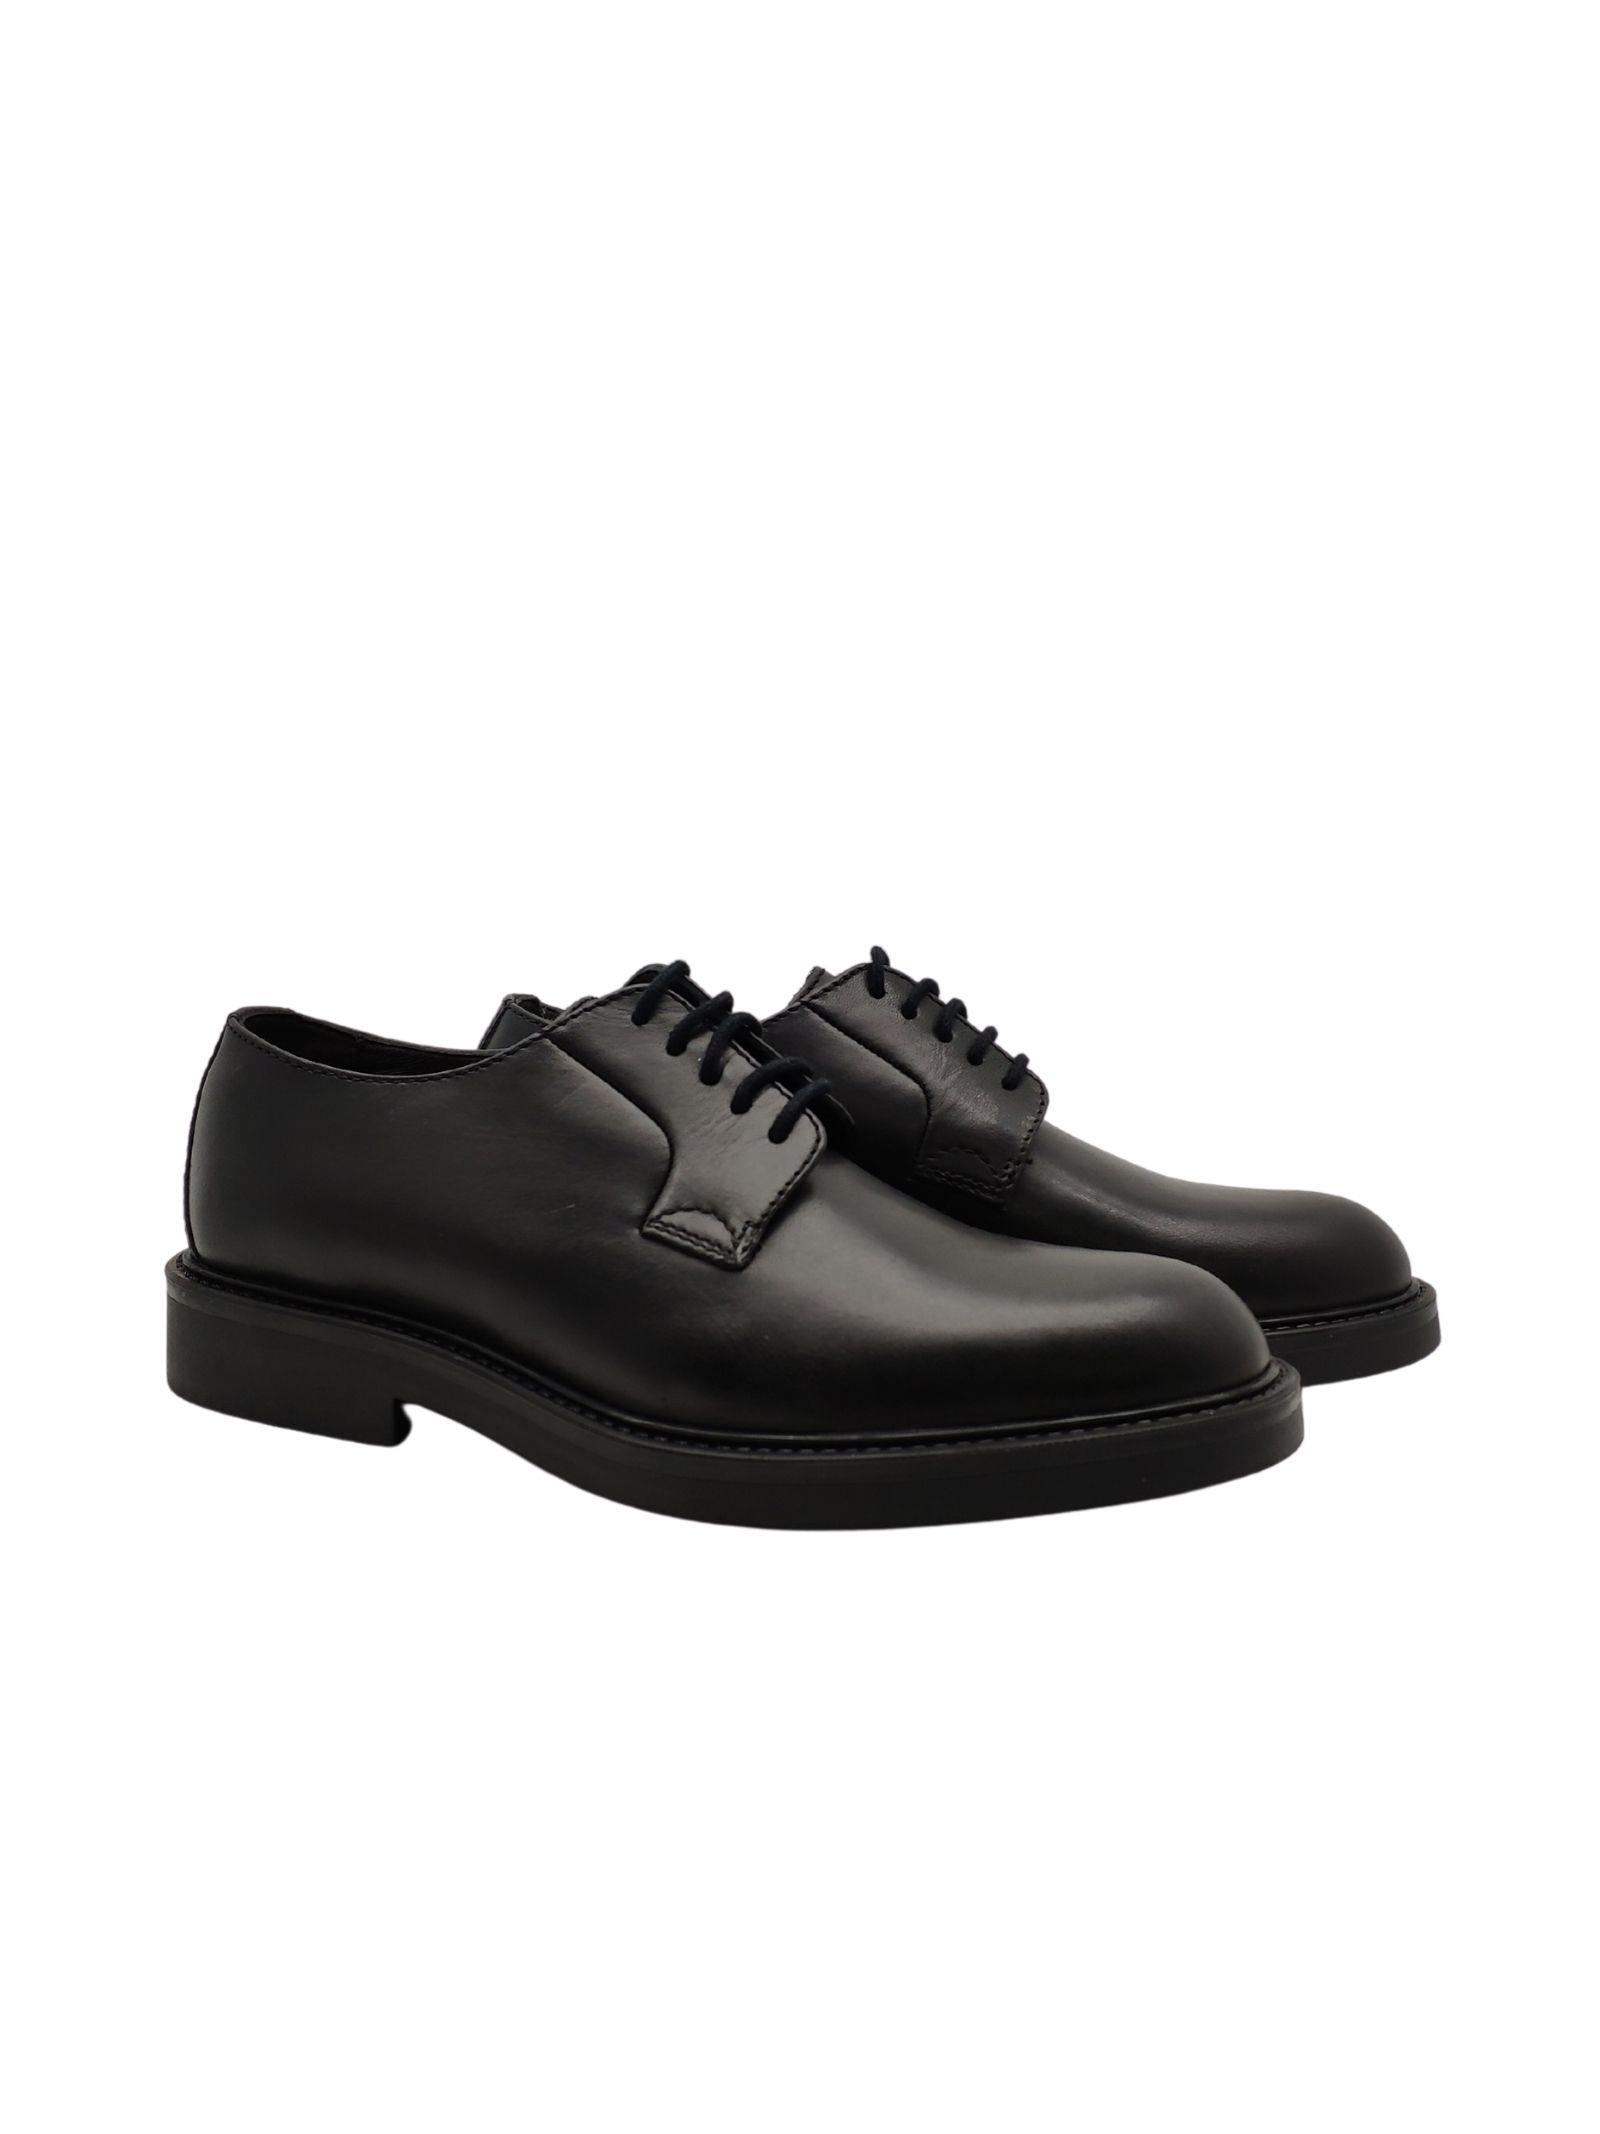 Valerio | Lace up shoes | T1101NERO